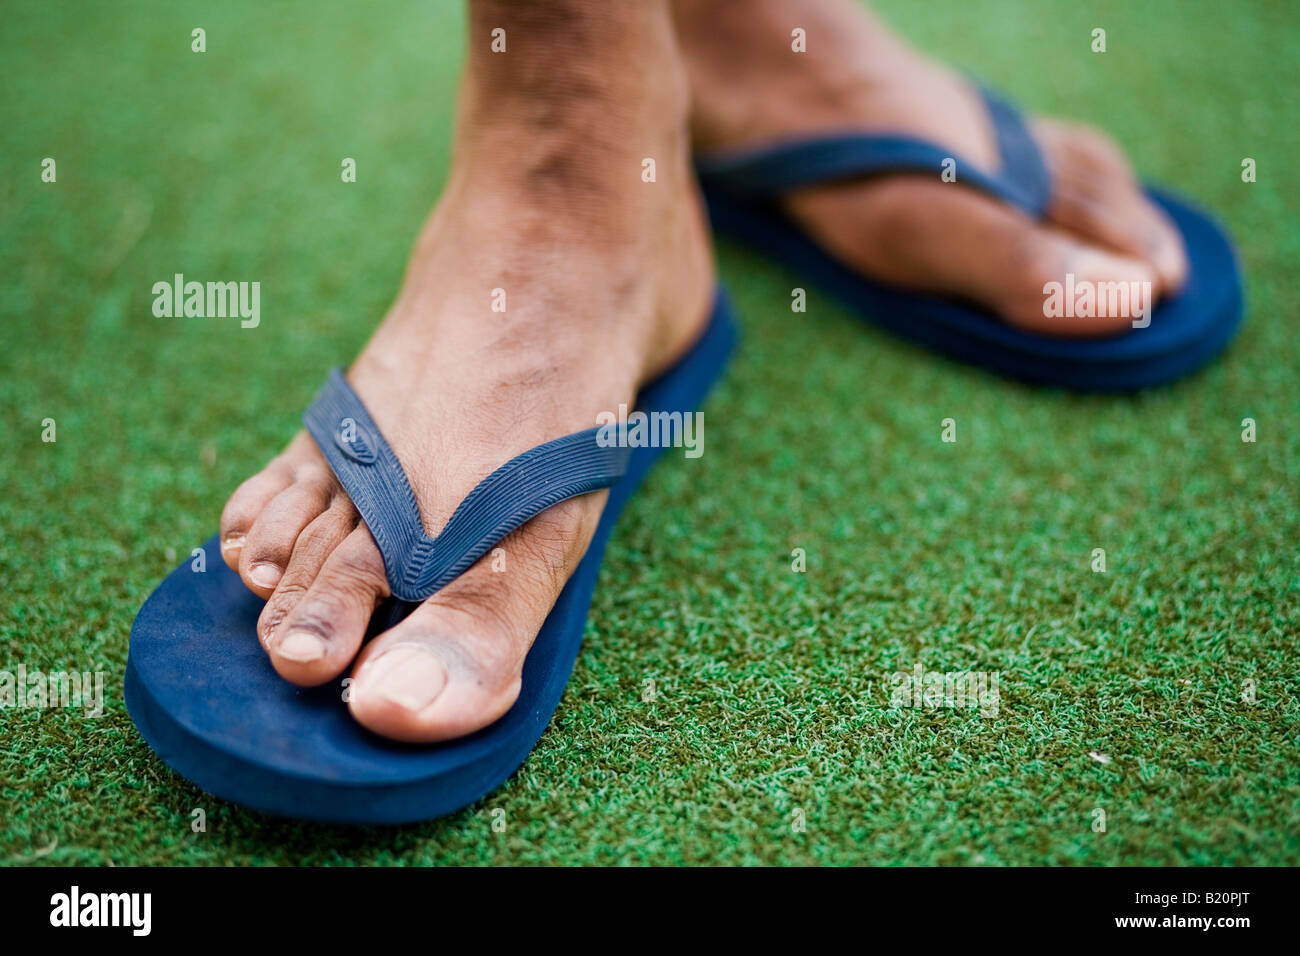 f25f120c814ea Front view of man s feet wearing blue flip flops Stock Photo ...